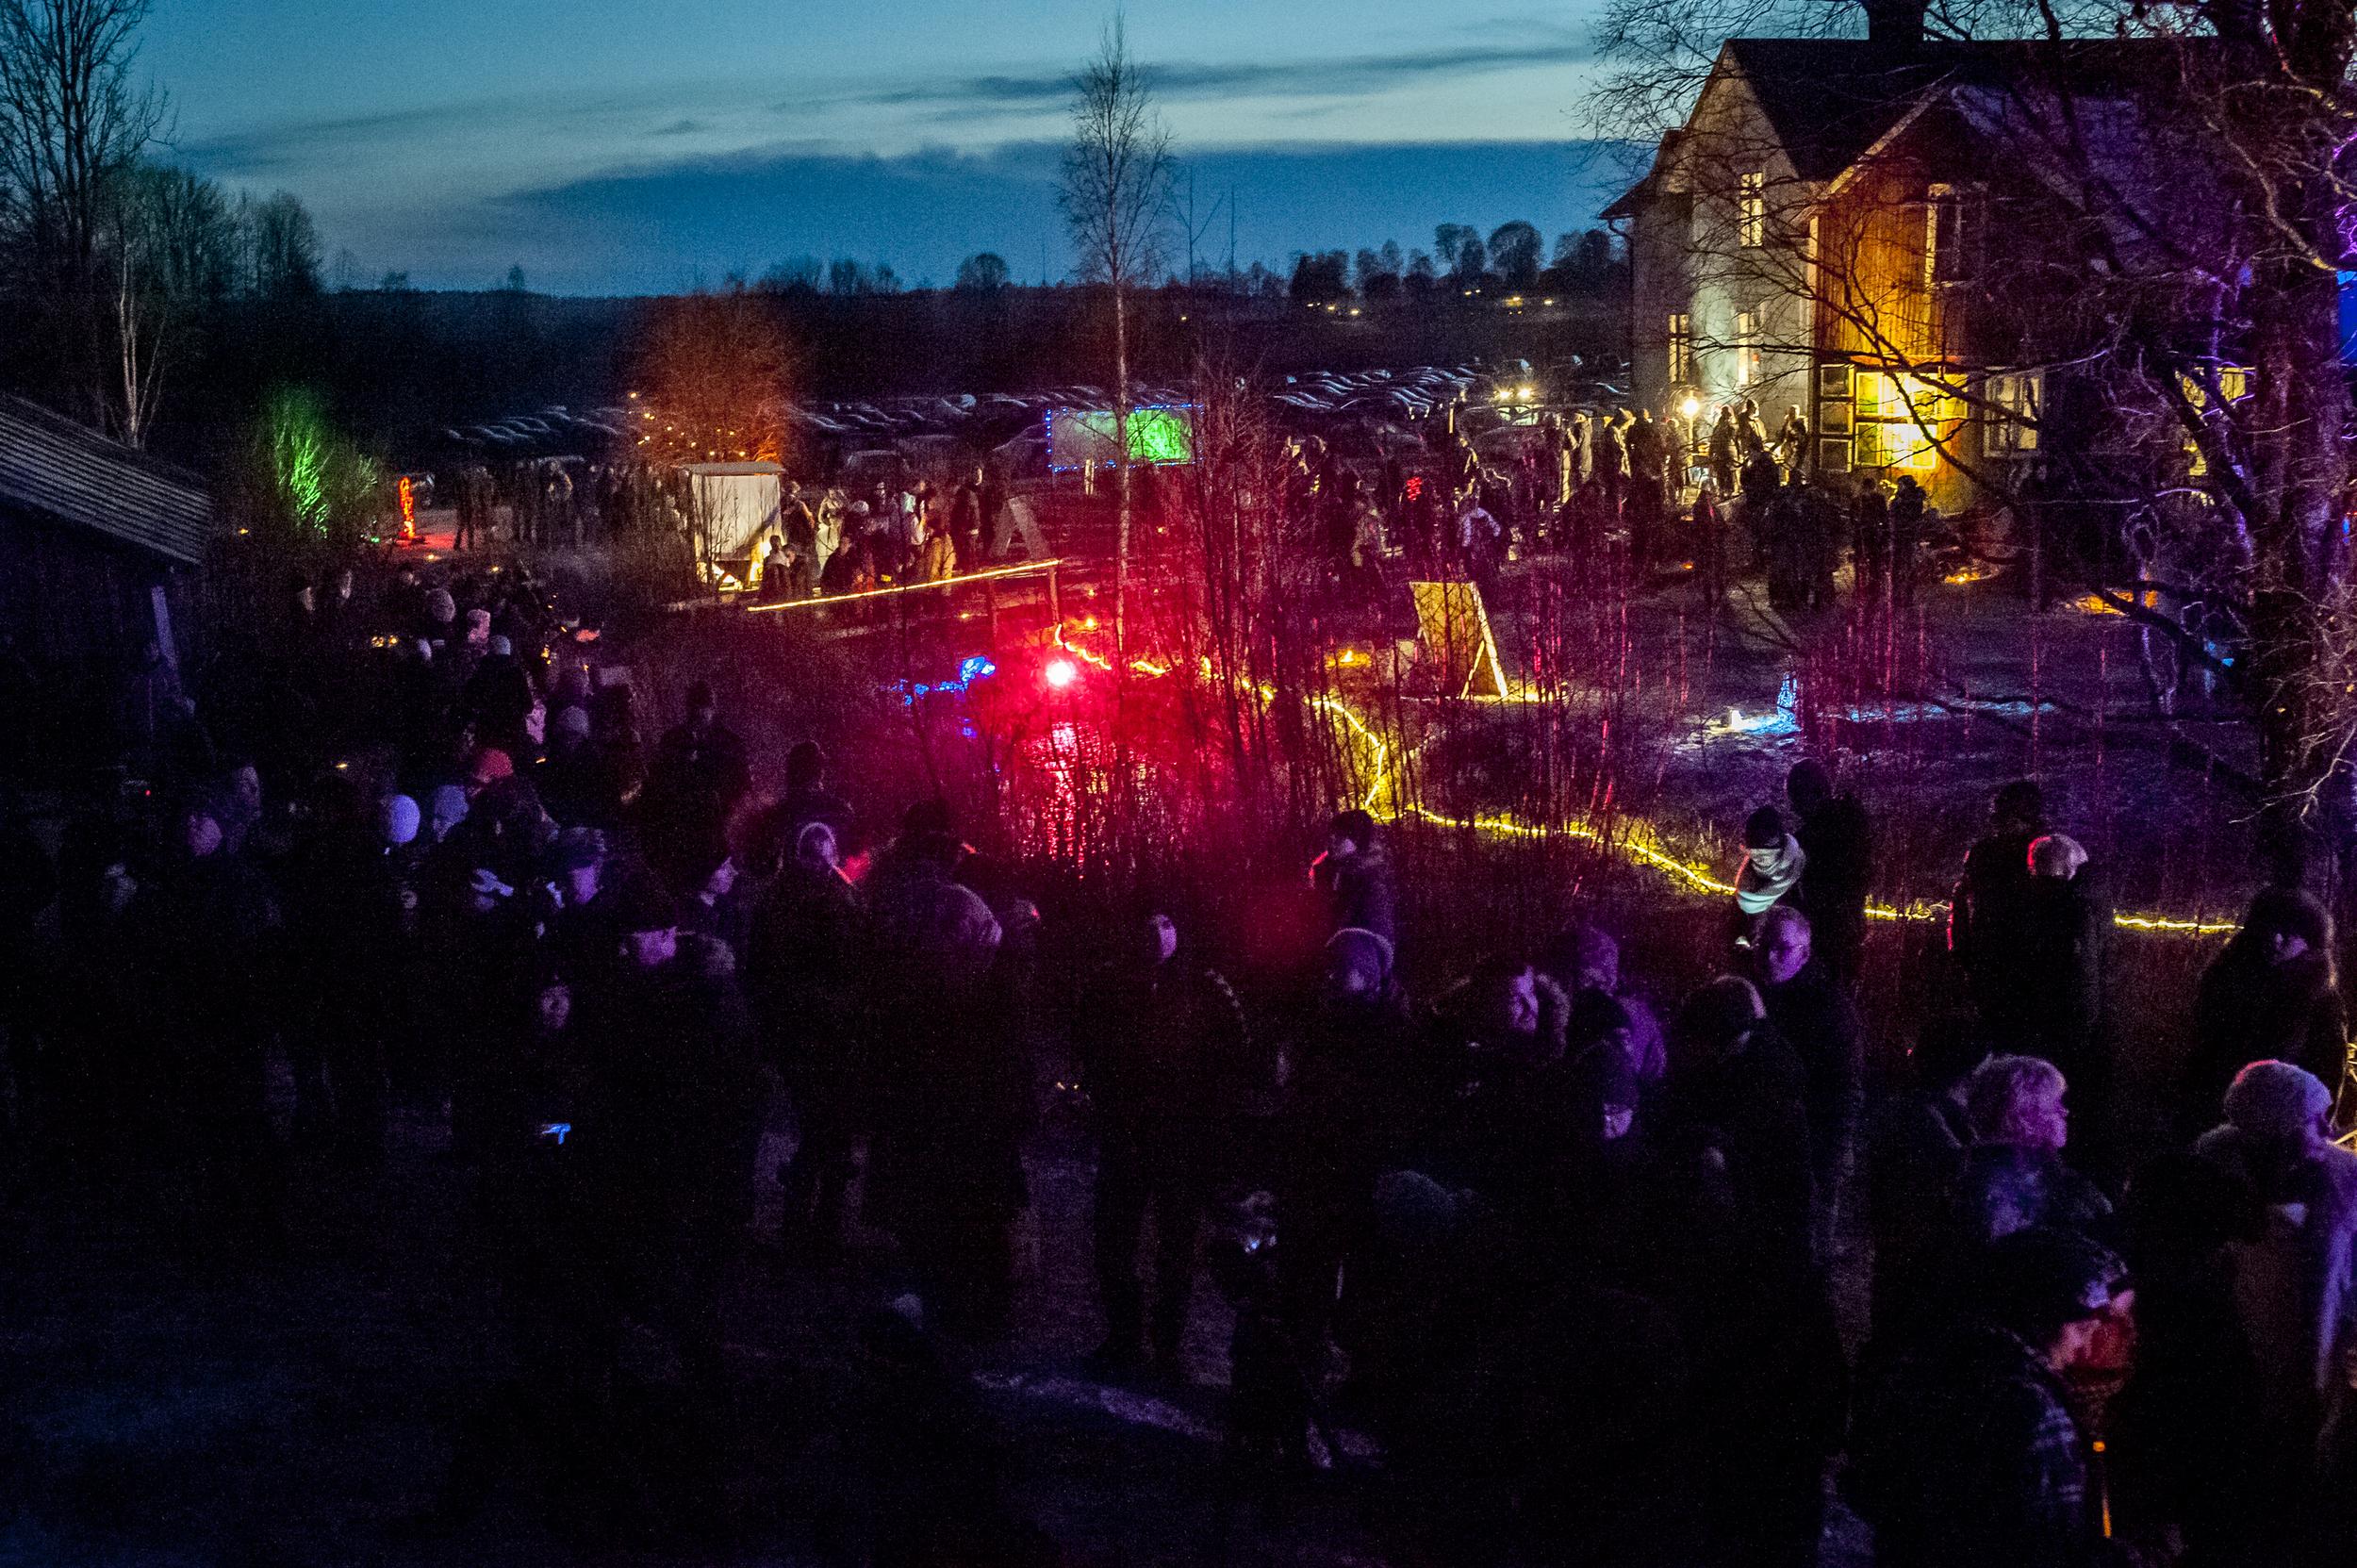 Midvinterglöd 13 December 2014 - Vinterväsen. Foto: Martin Burmester,   www.martinburmester.eu